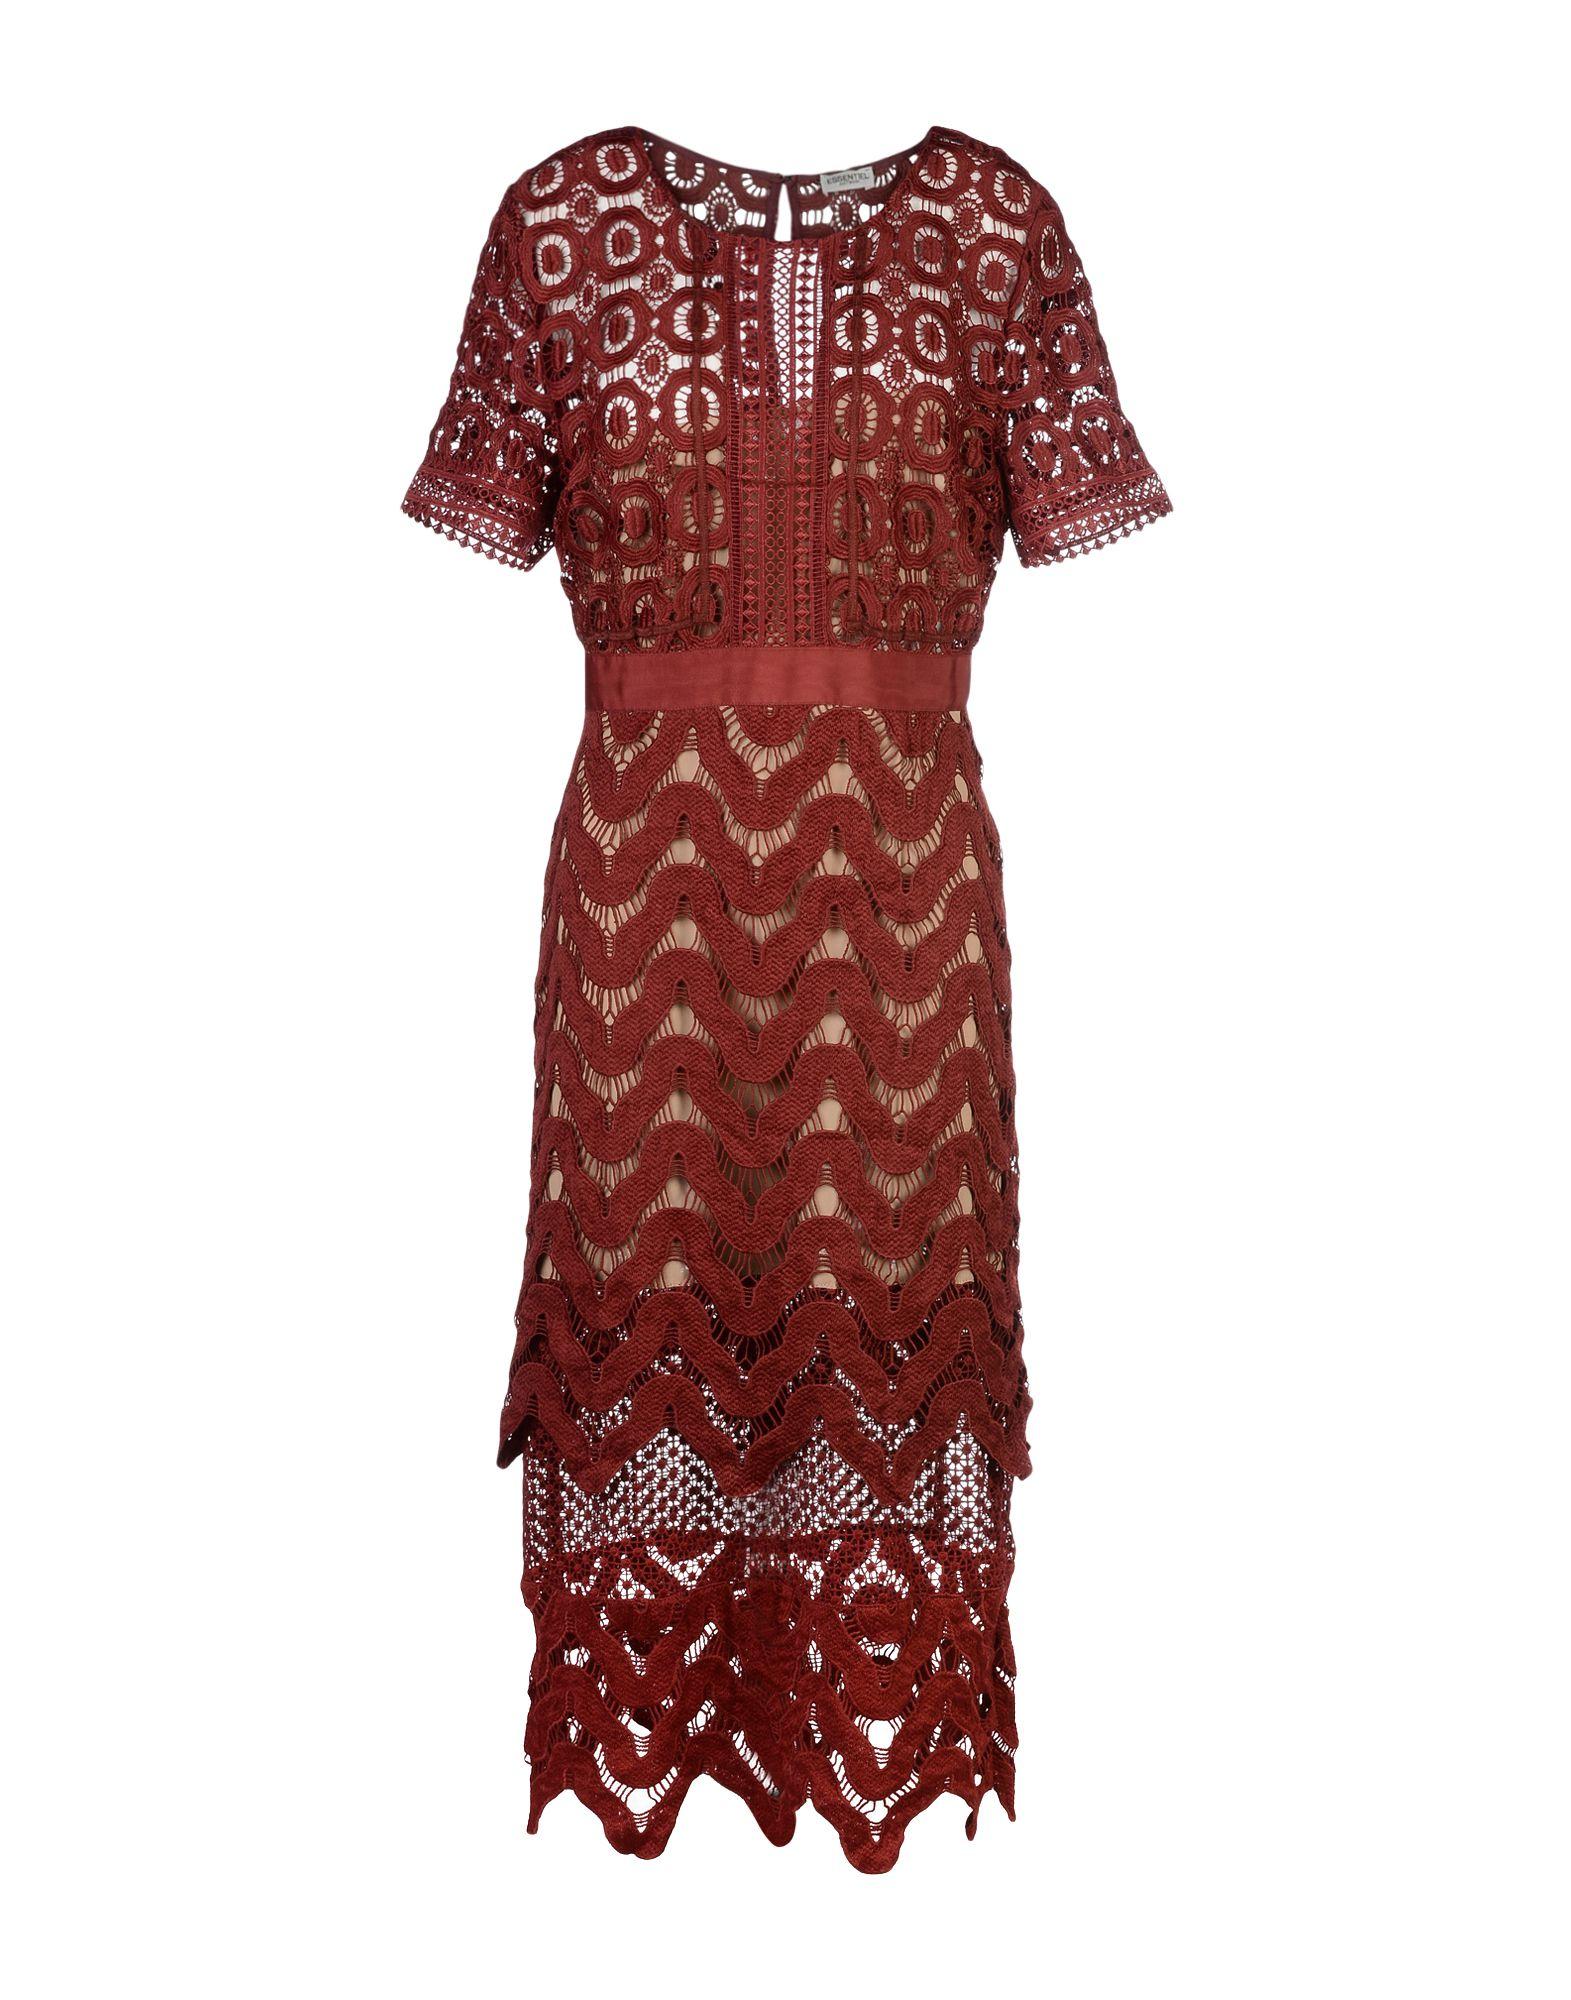 ESSENTIEL ANTWERP Платье длиной 3/4 essentiel antwerp платье длиной 3 4